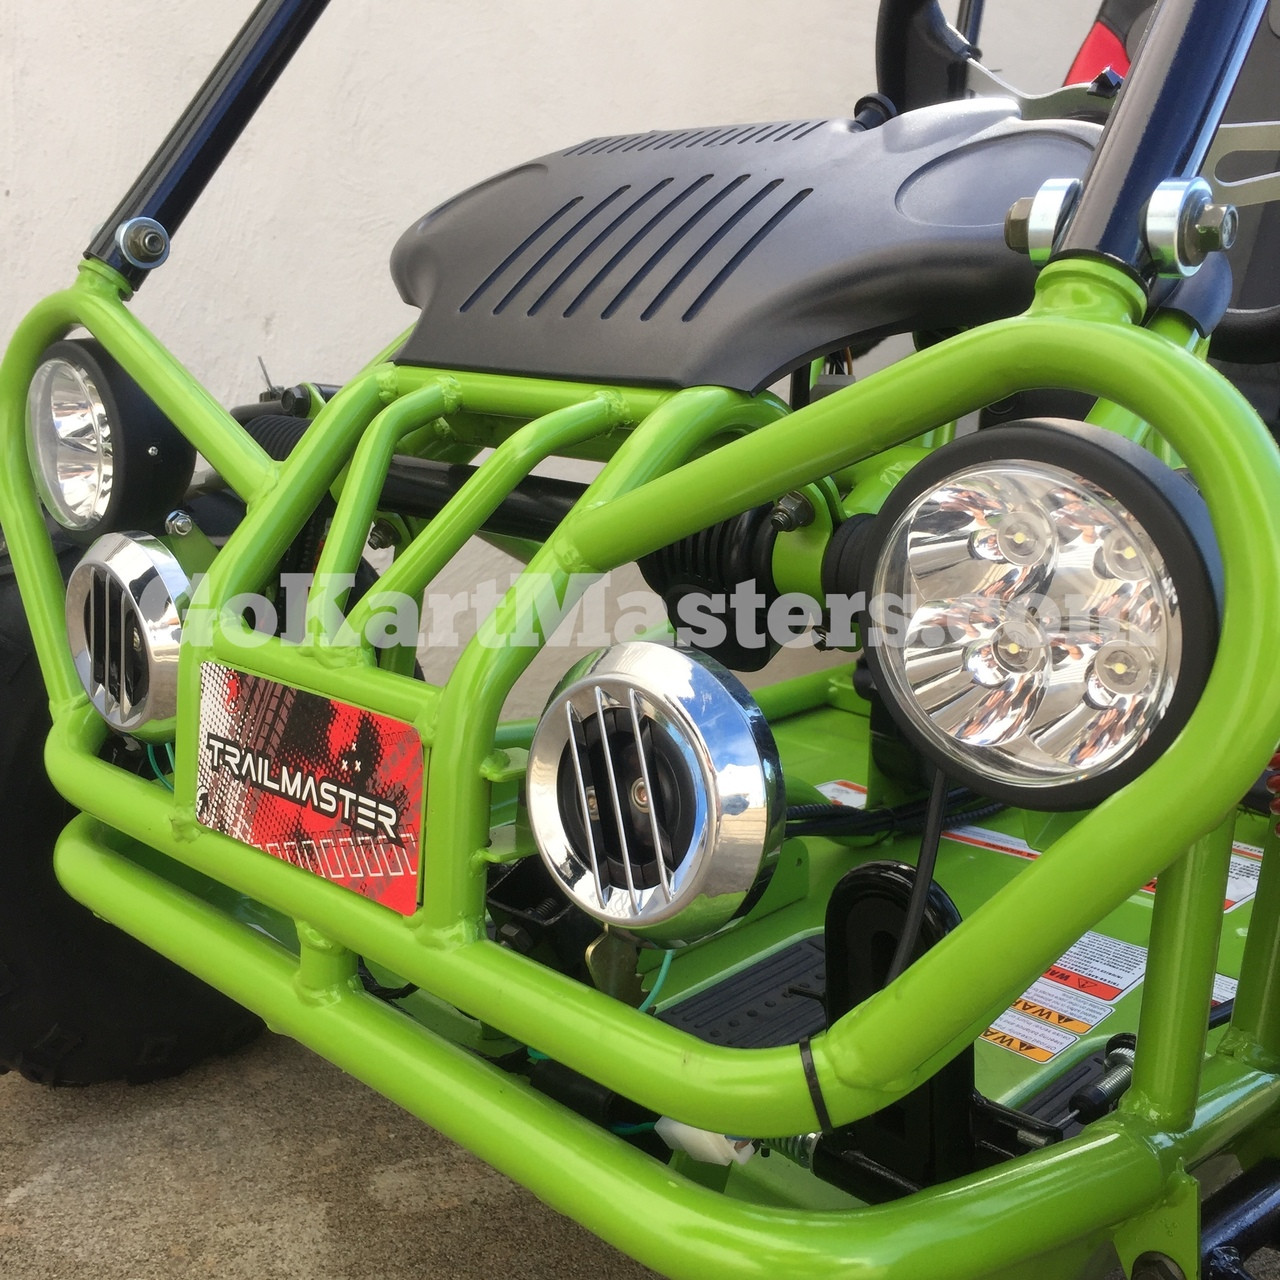 TrailMaster Mini XRX/R+ Go Kart - Headlights  & Horn